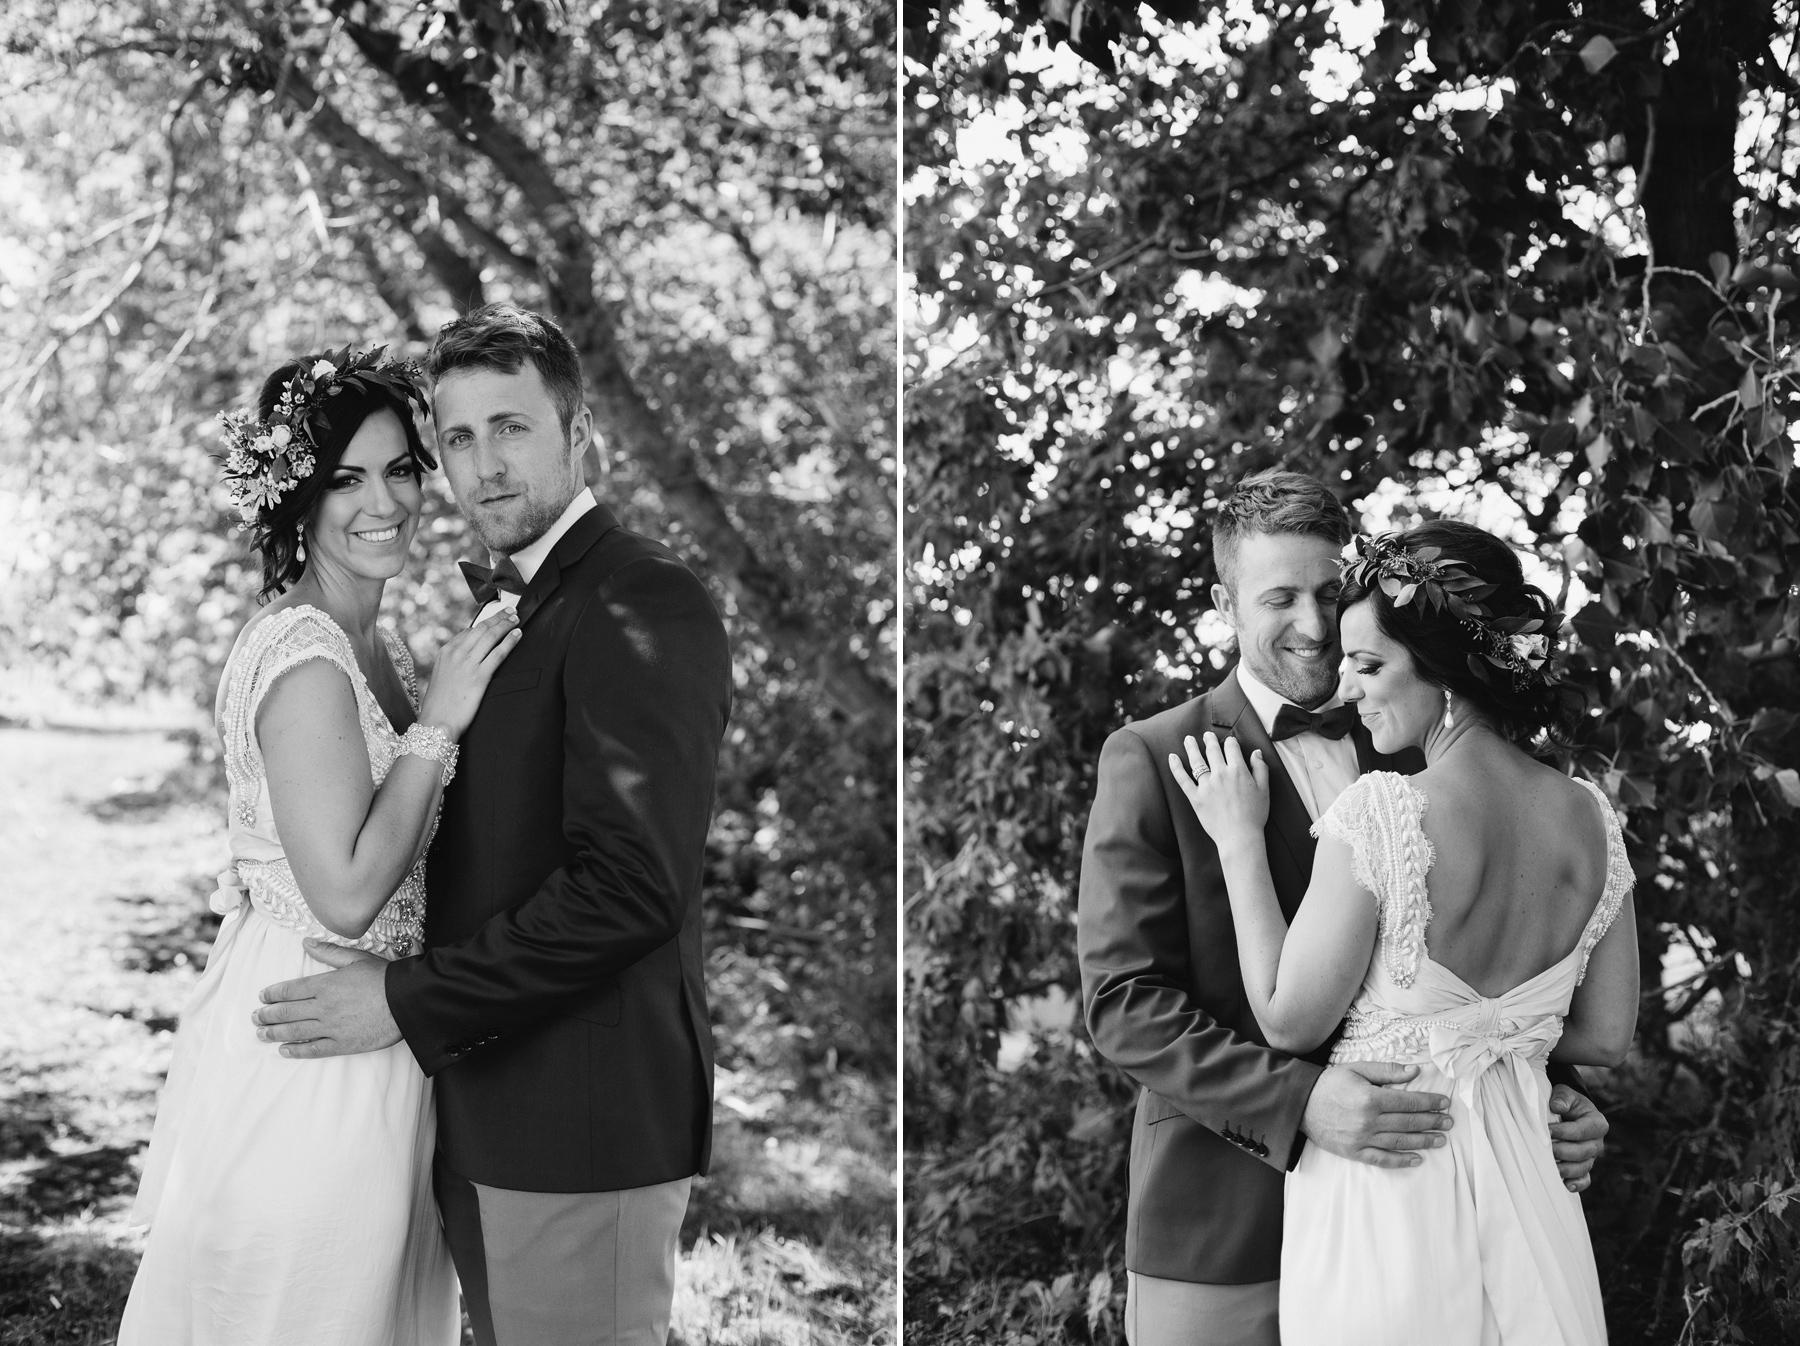 alberta-farm-wedding-photographer-rp-wj-055.jpg